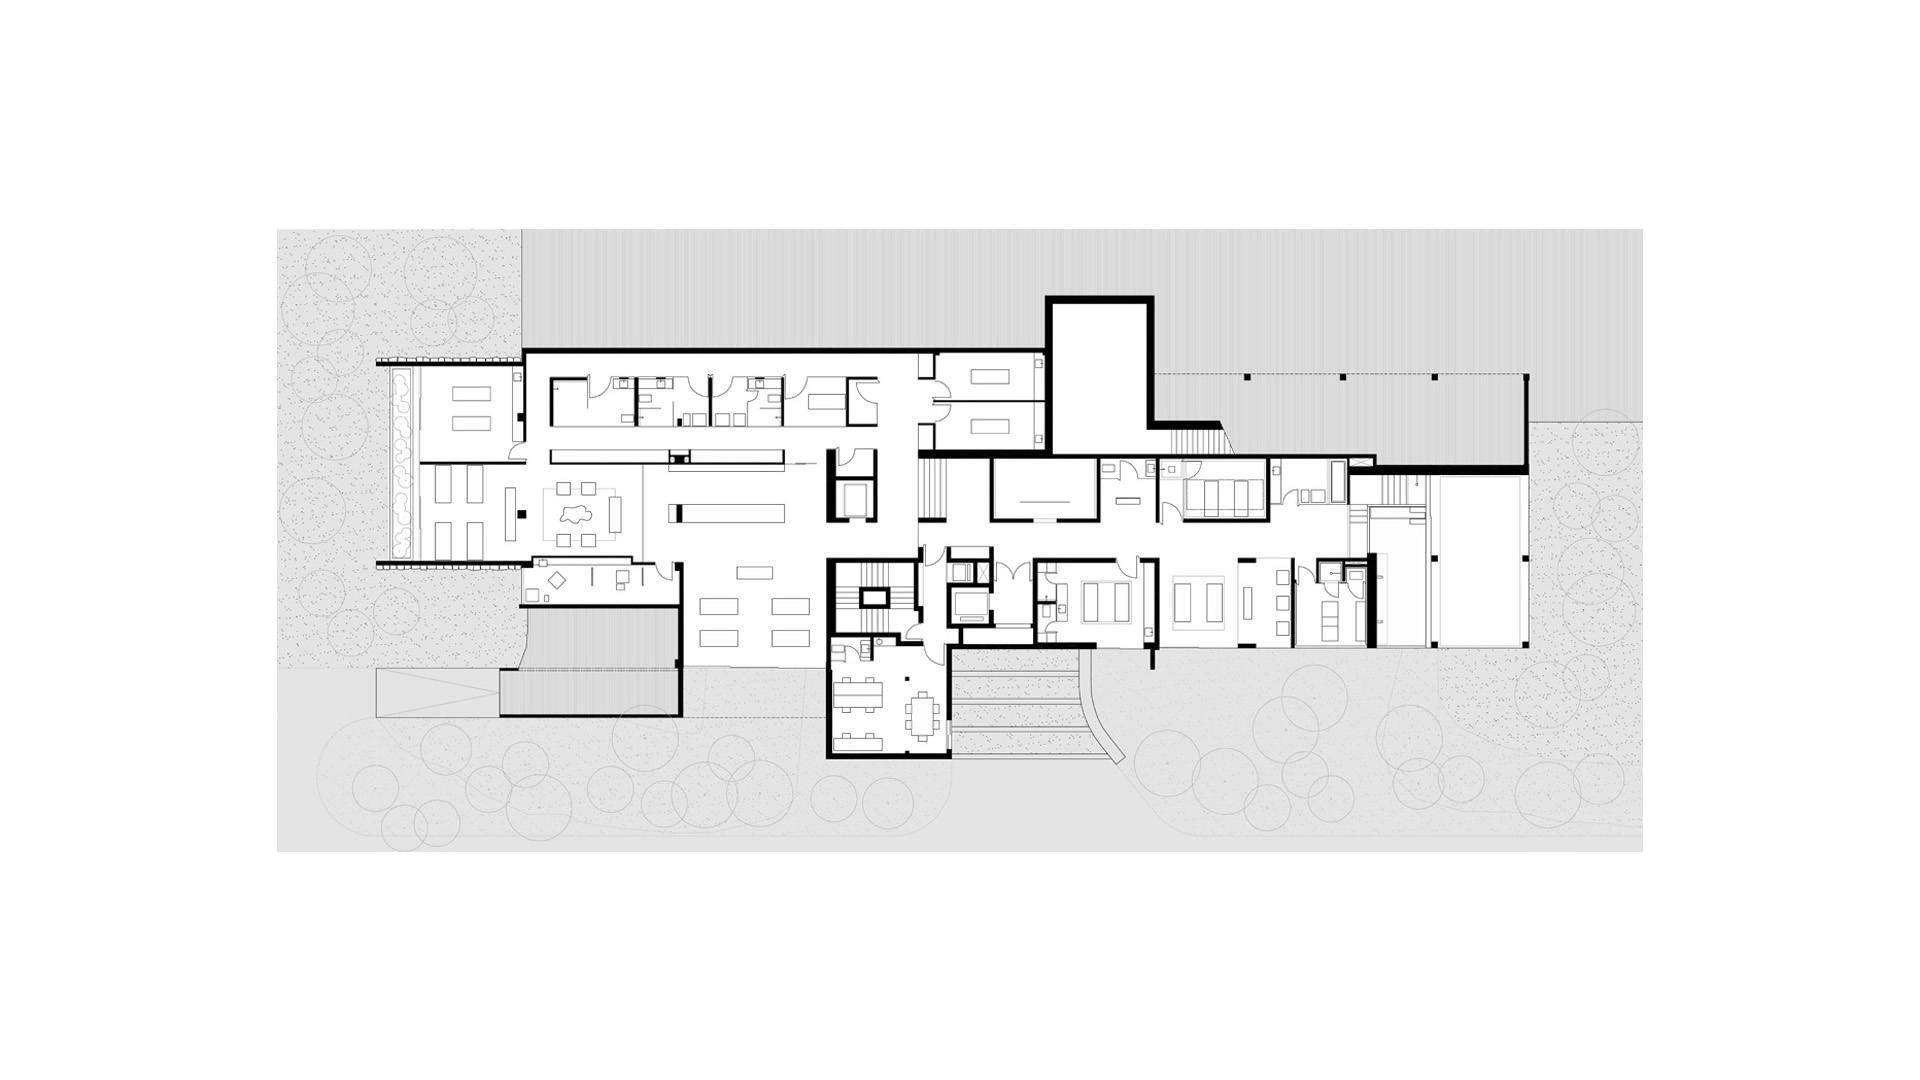 spa-botanique-planta-de-arquitetura